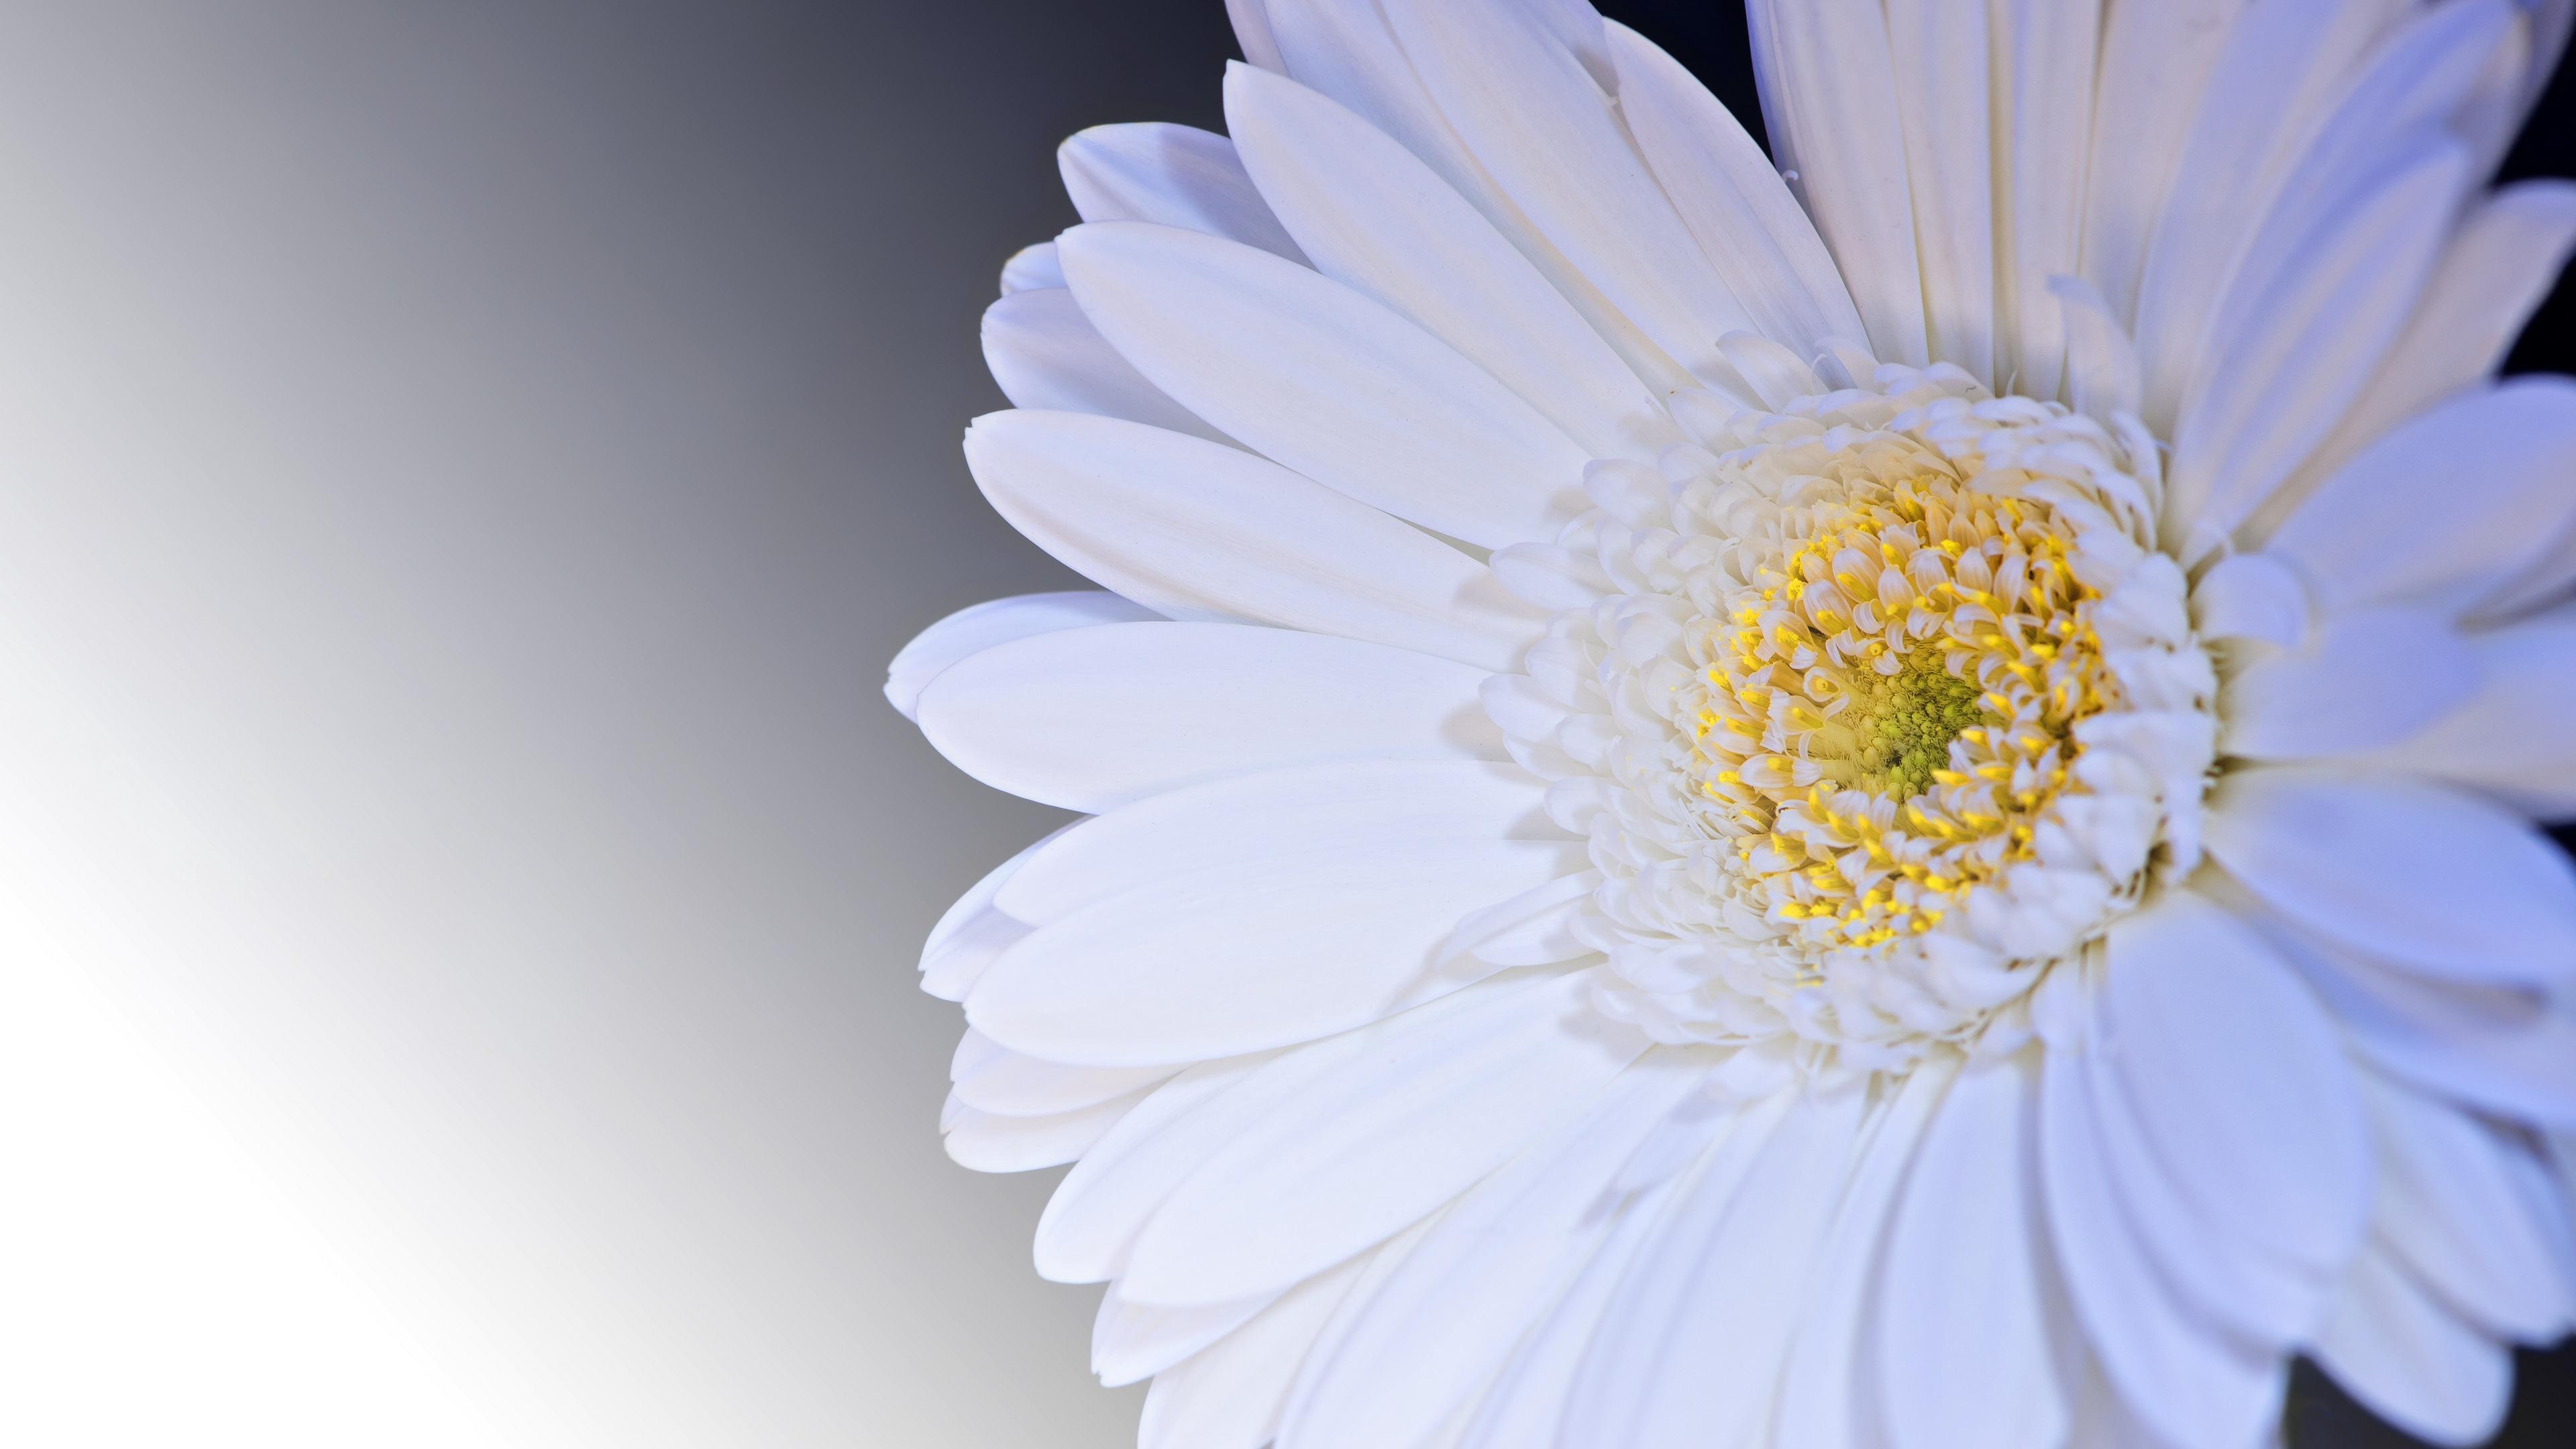 gerbera flower petals white 4k 1540064733 - gerbera, flower, petals, white 4k - Petals, Gerbera, flower